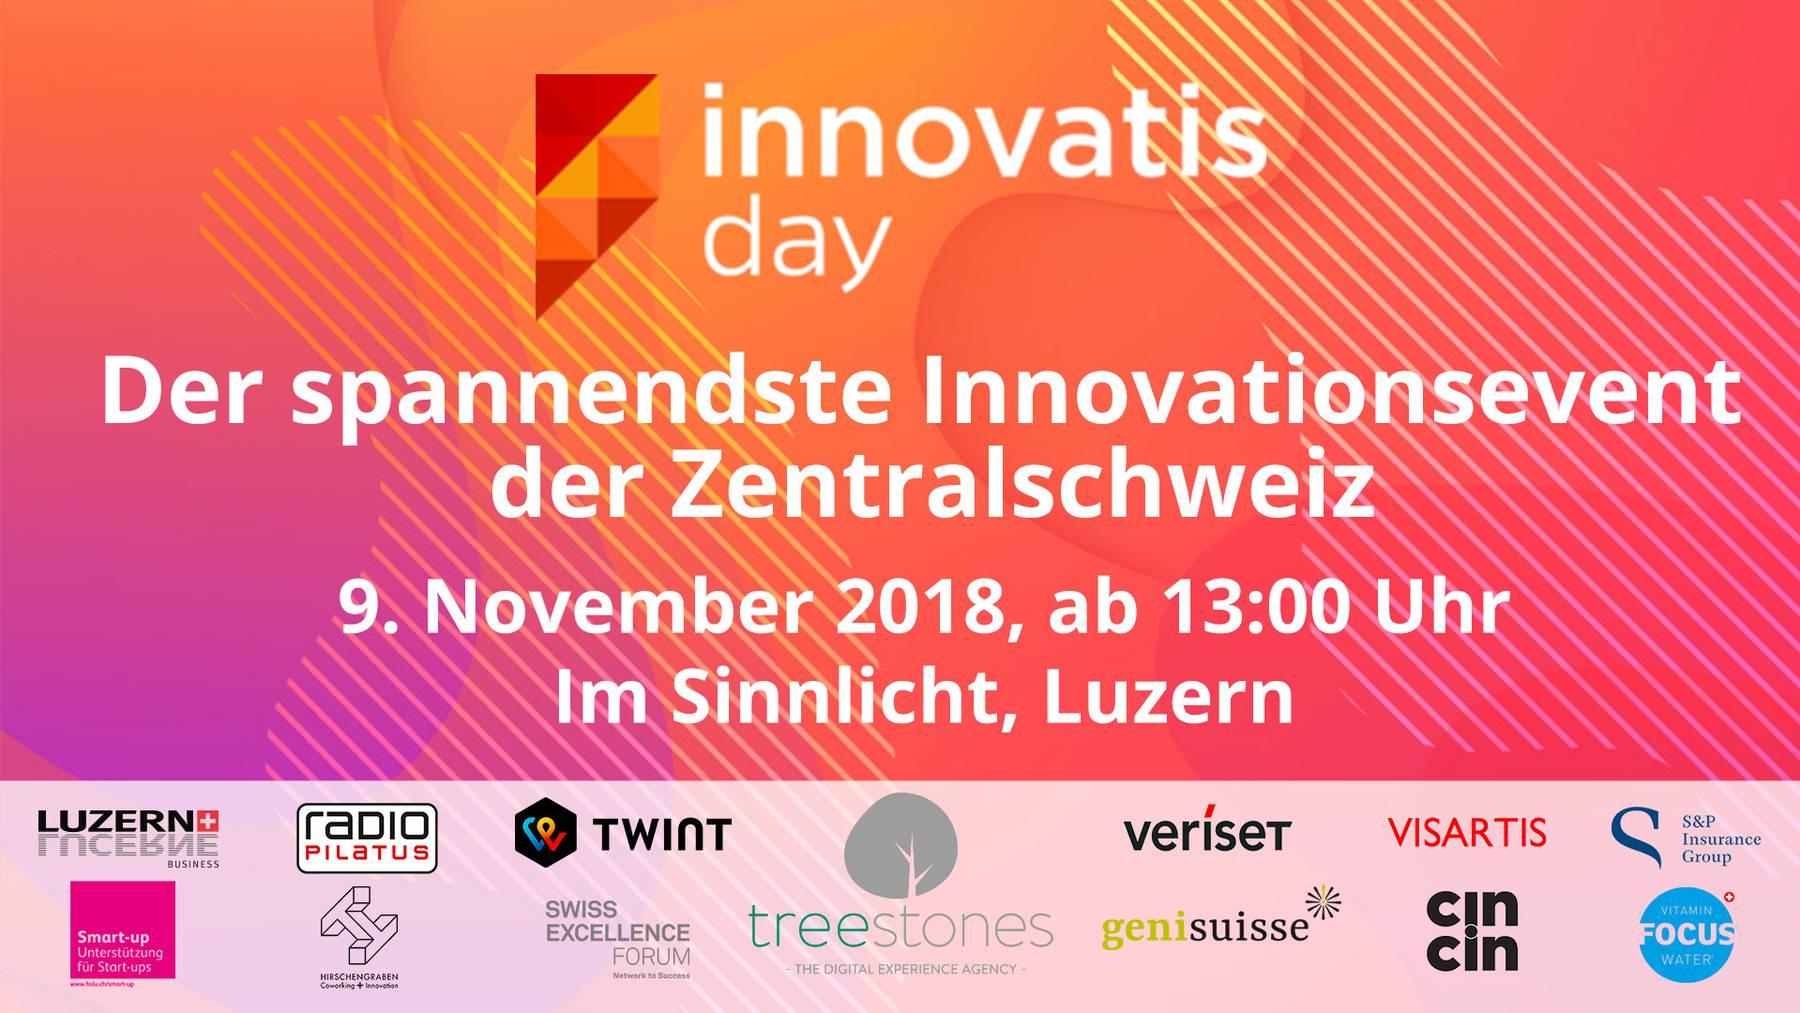 Vernetzt: Innovations-Tag am 9. November in Luzern